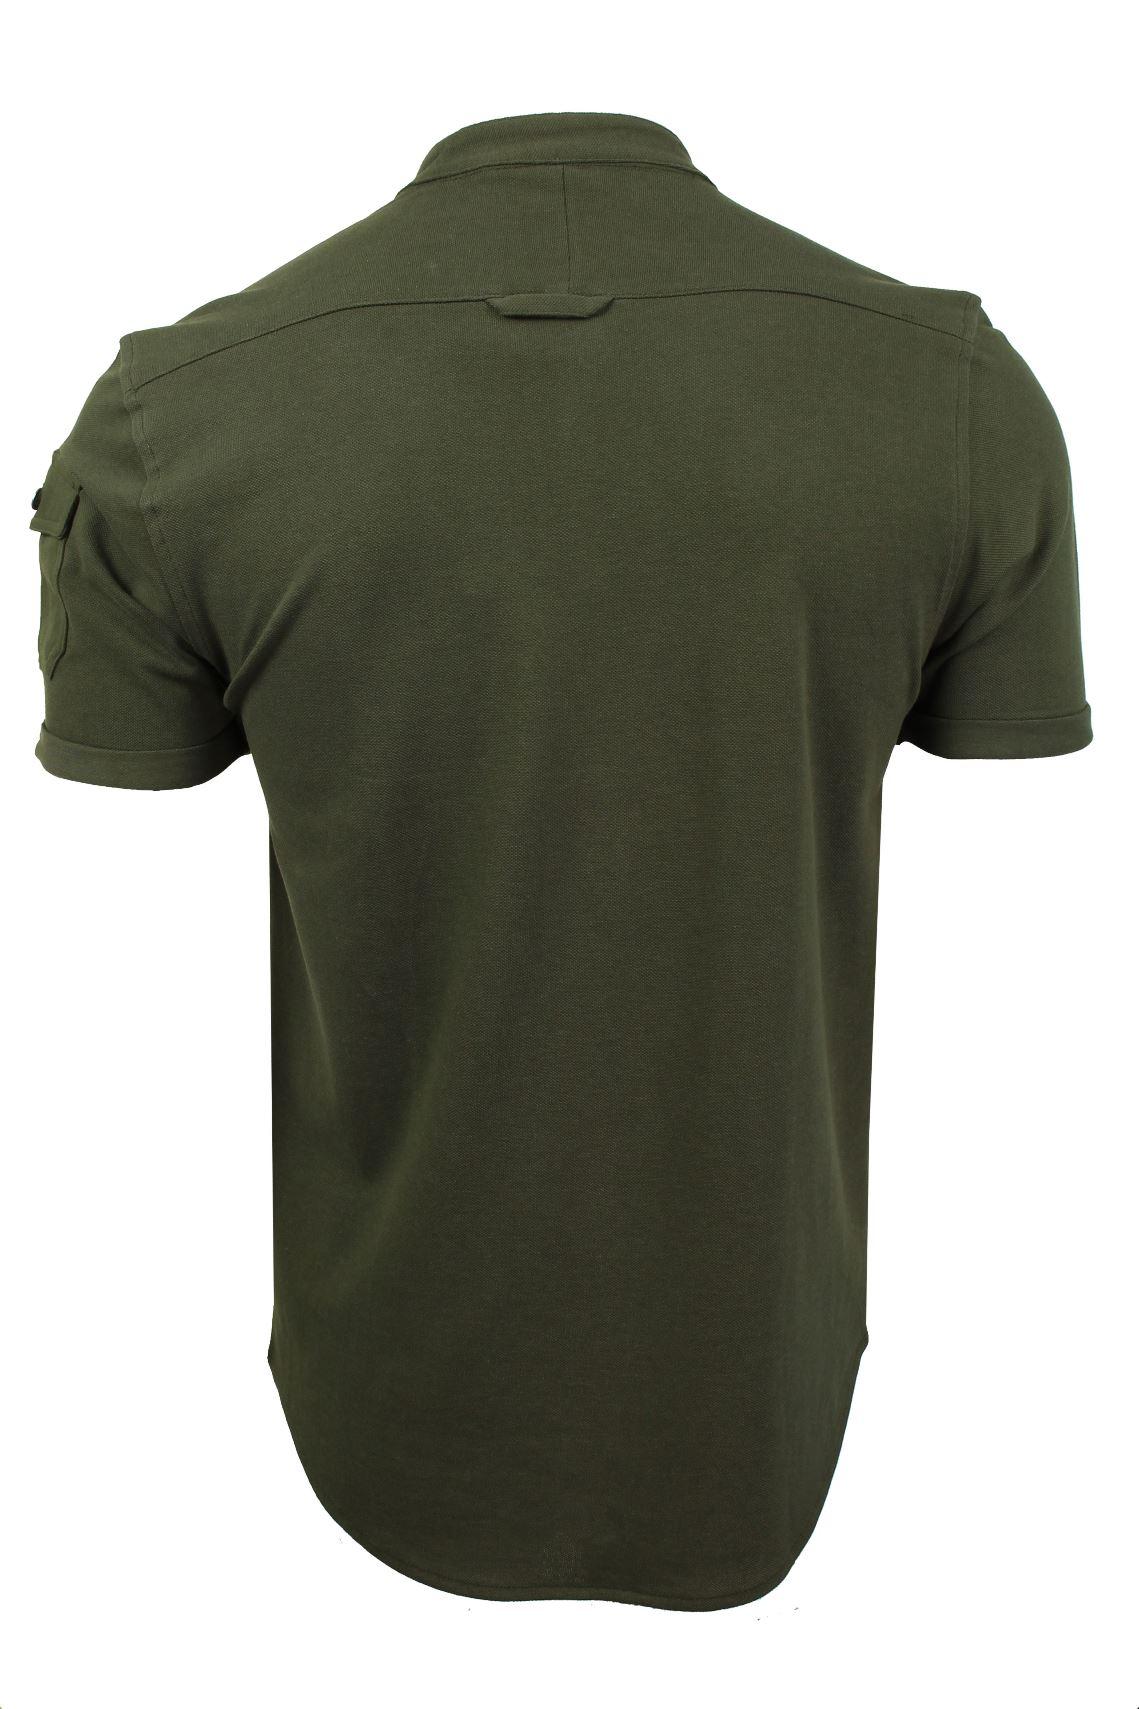 Mens-Grandad-Collar-Pique-Shirt-by-Brave-Soul-039-Joey-039 thumbnail 8